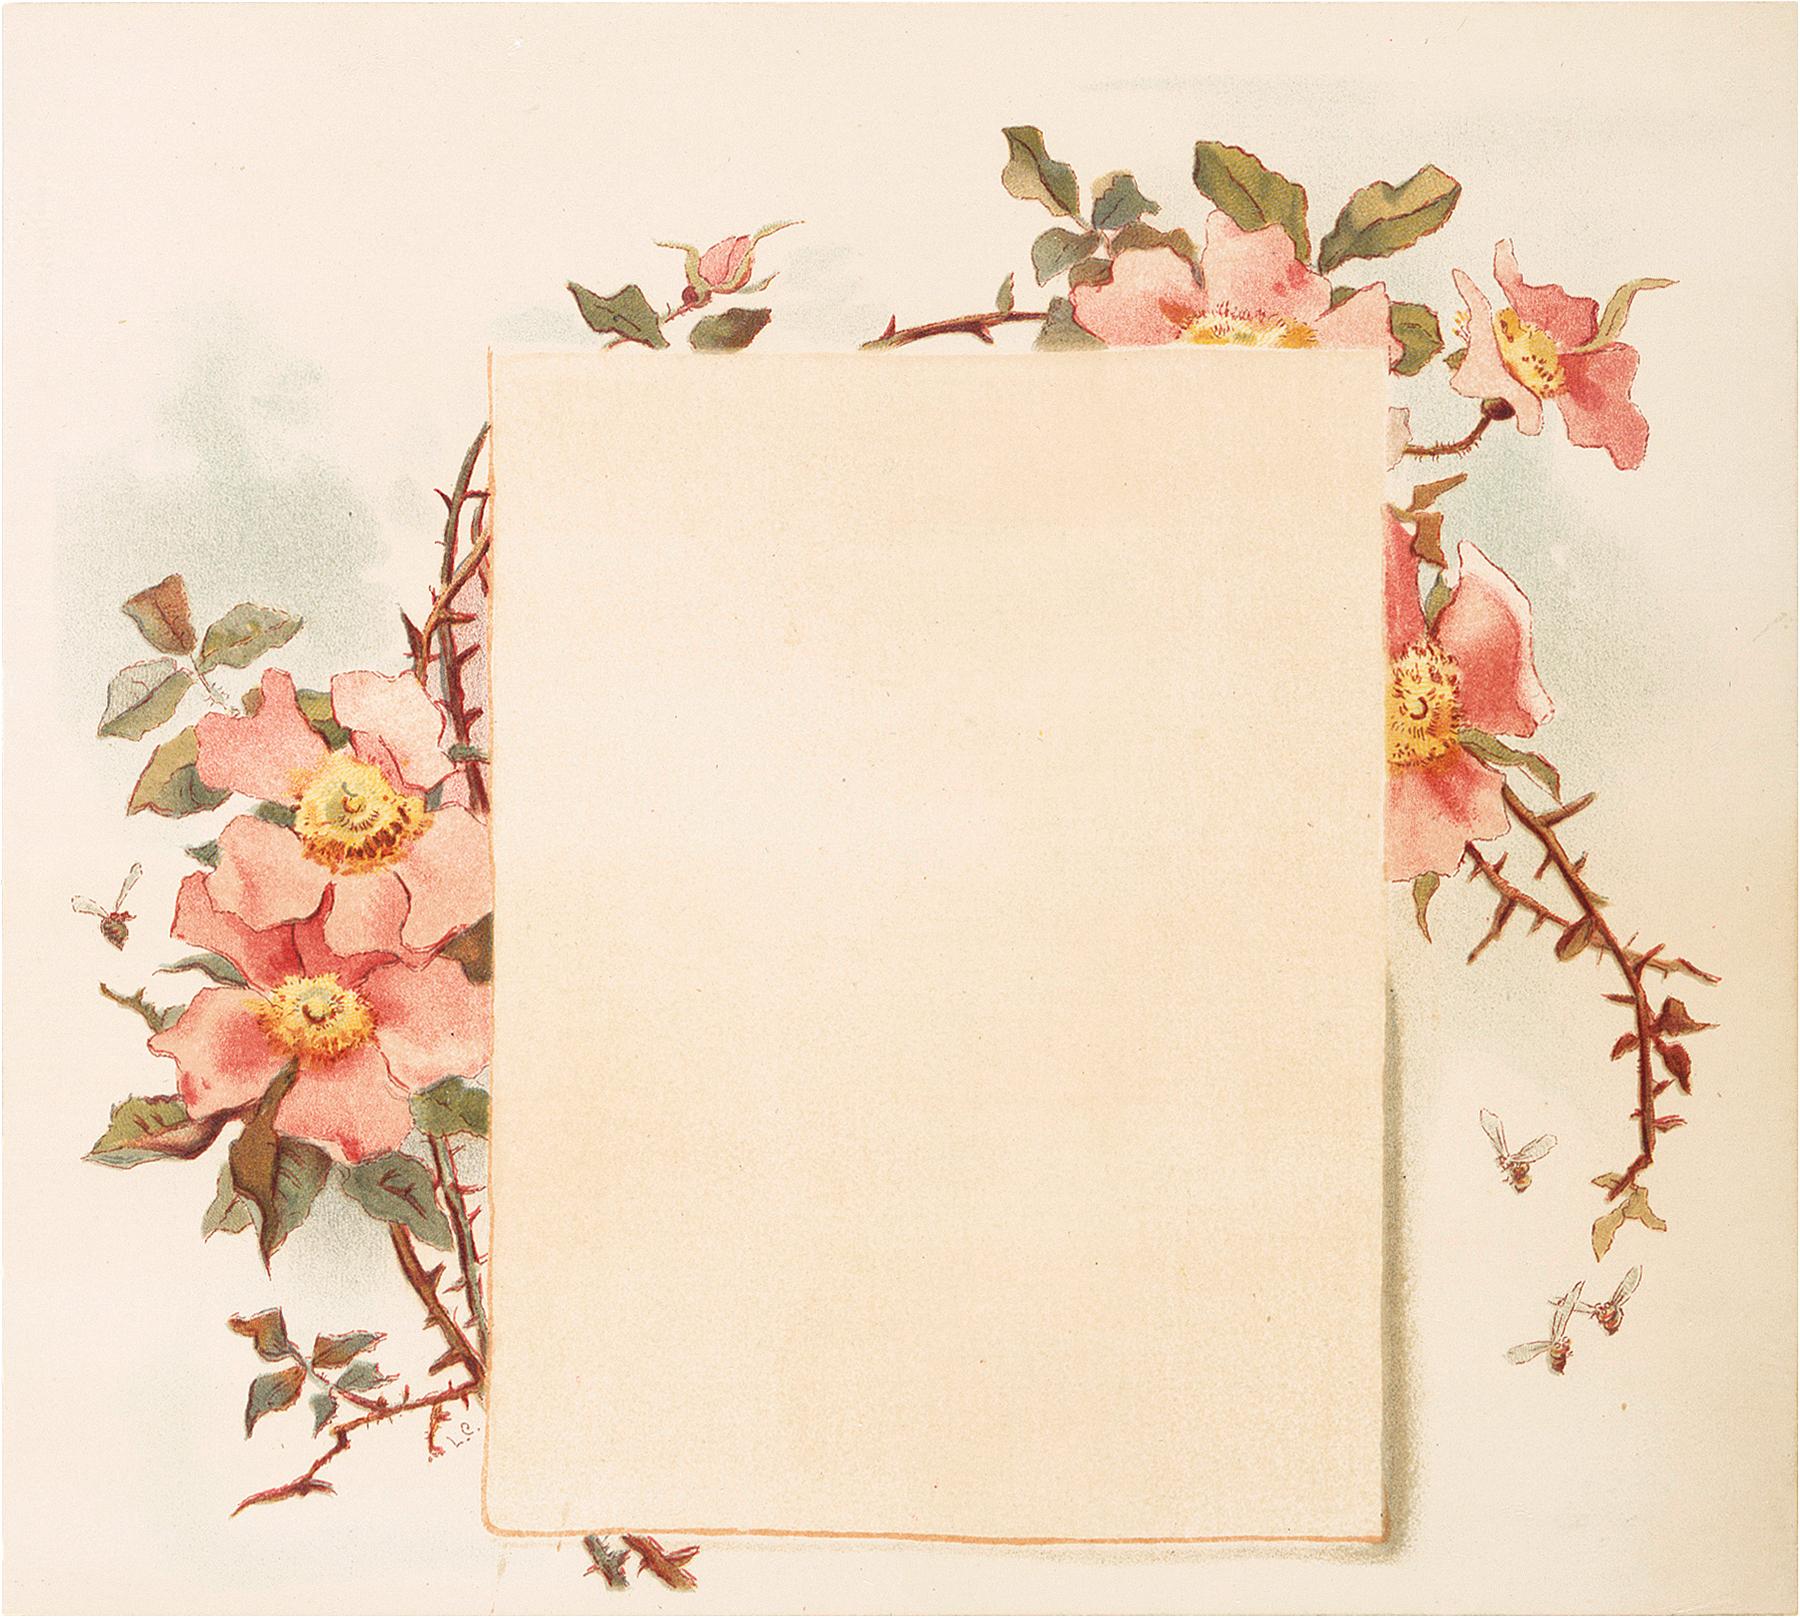 Peach Rose Frame Graphic